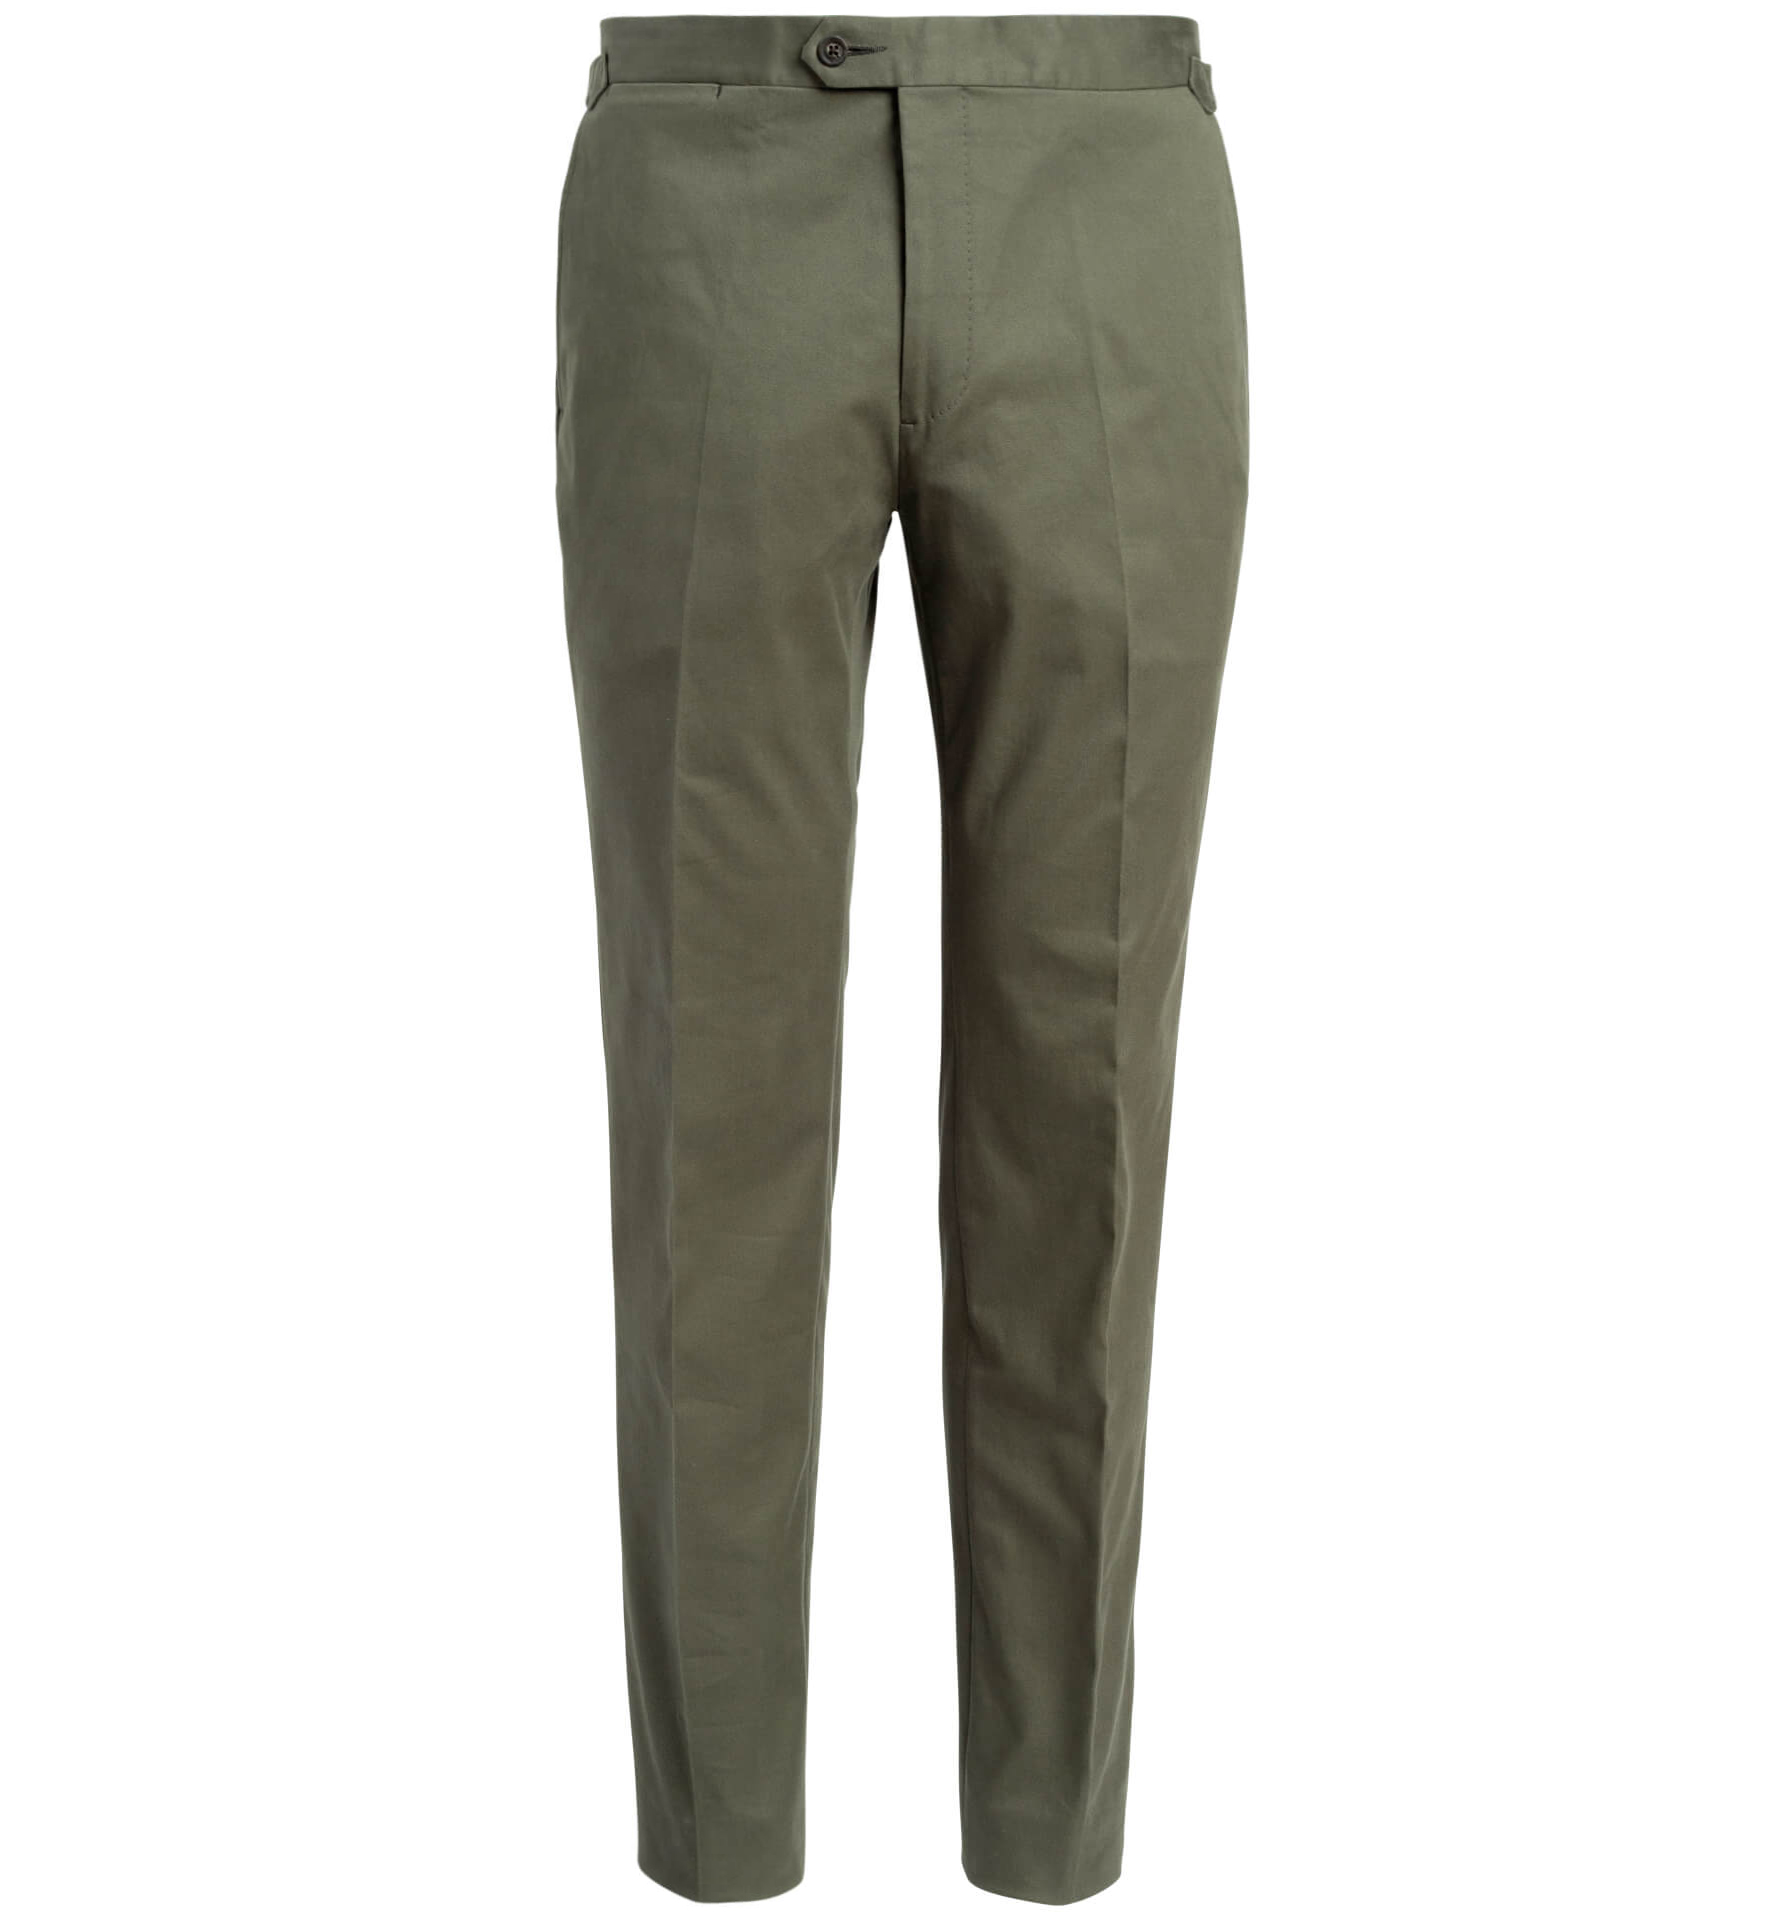 Zoom Image of Allen Fatigue Stretch Cotton Trouser